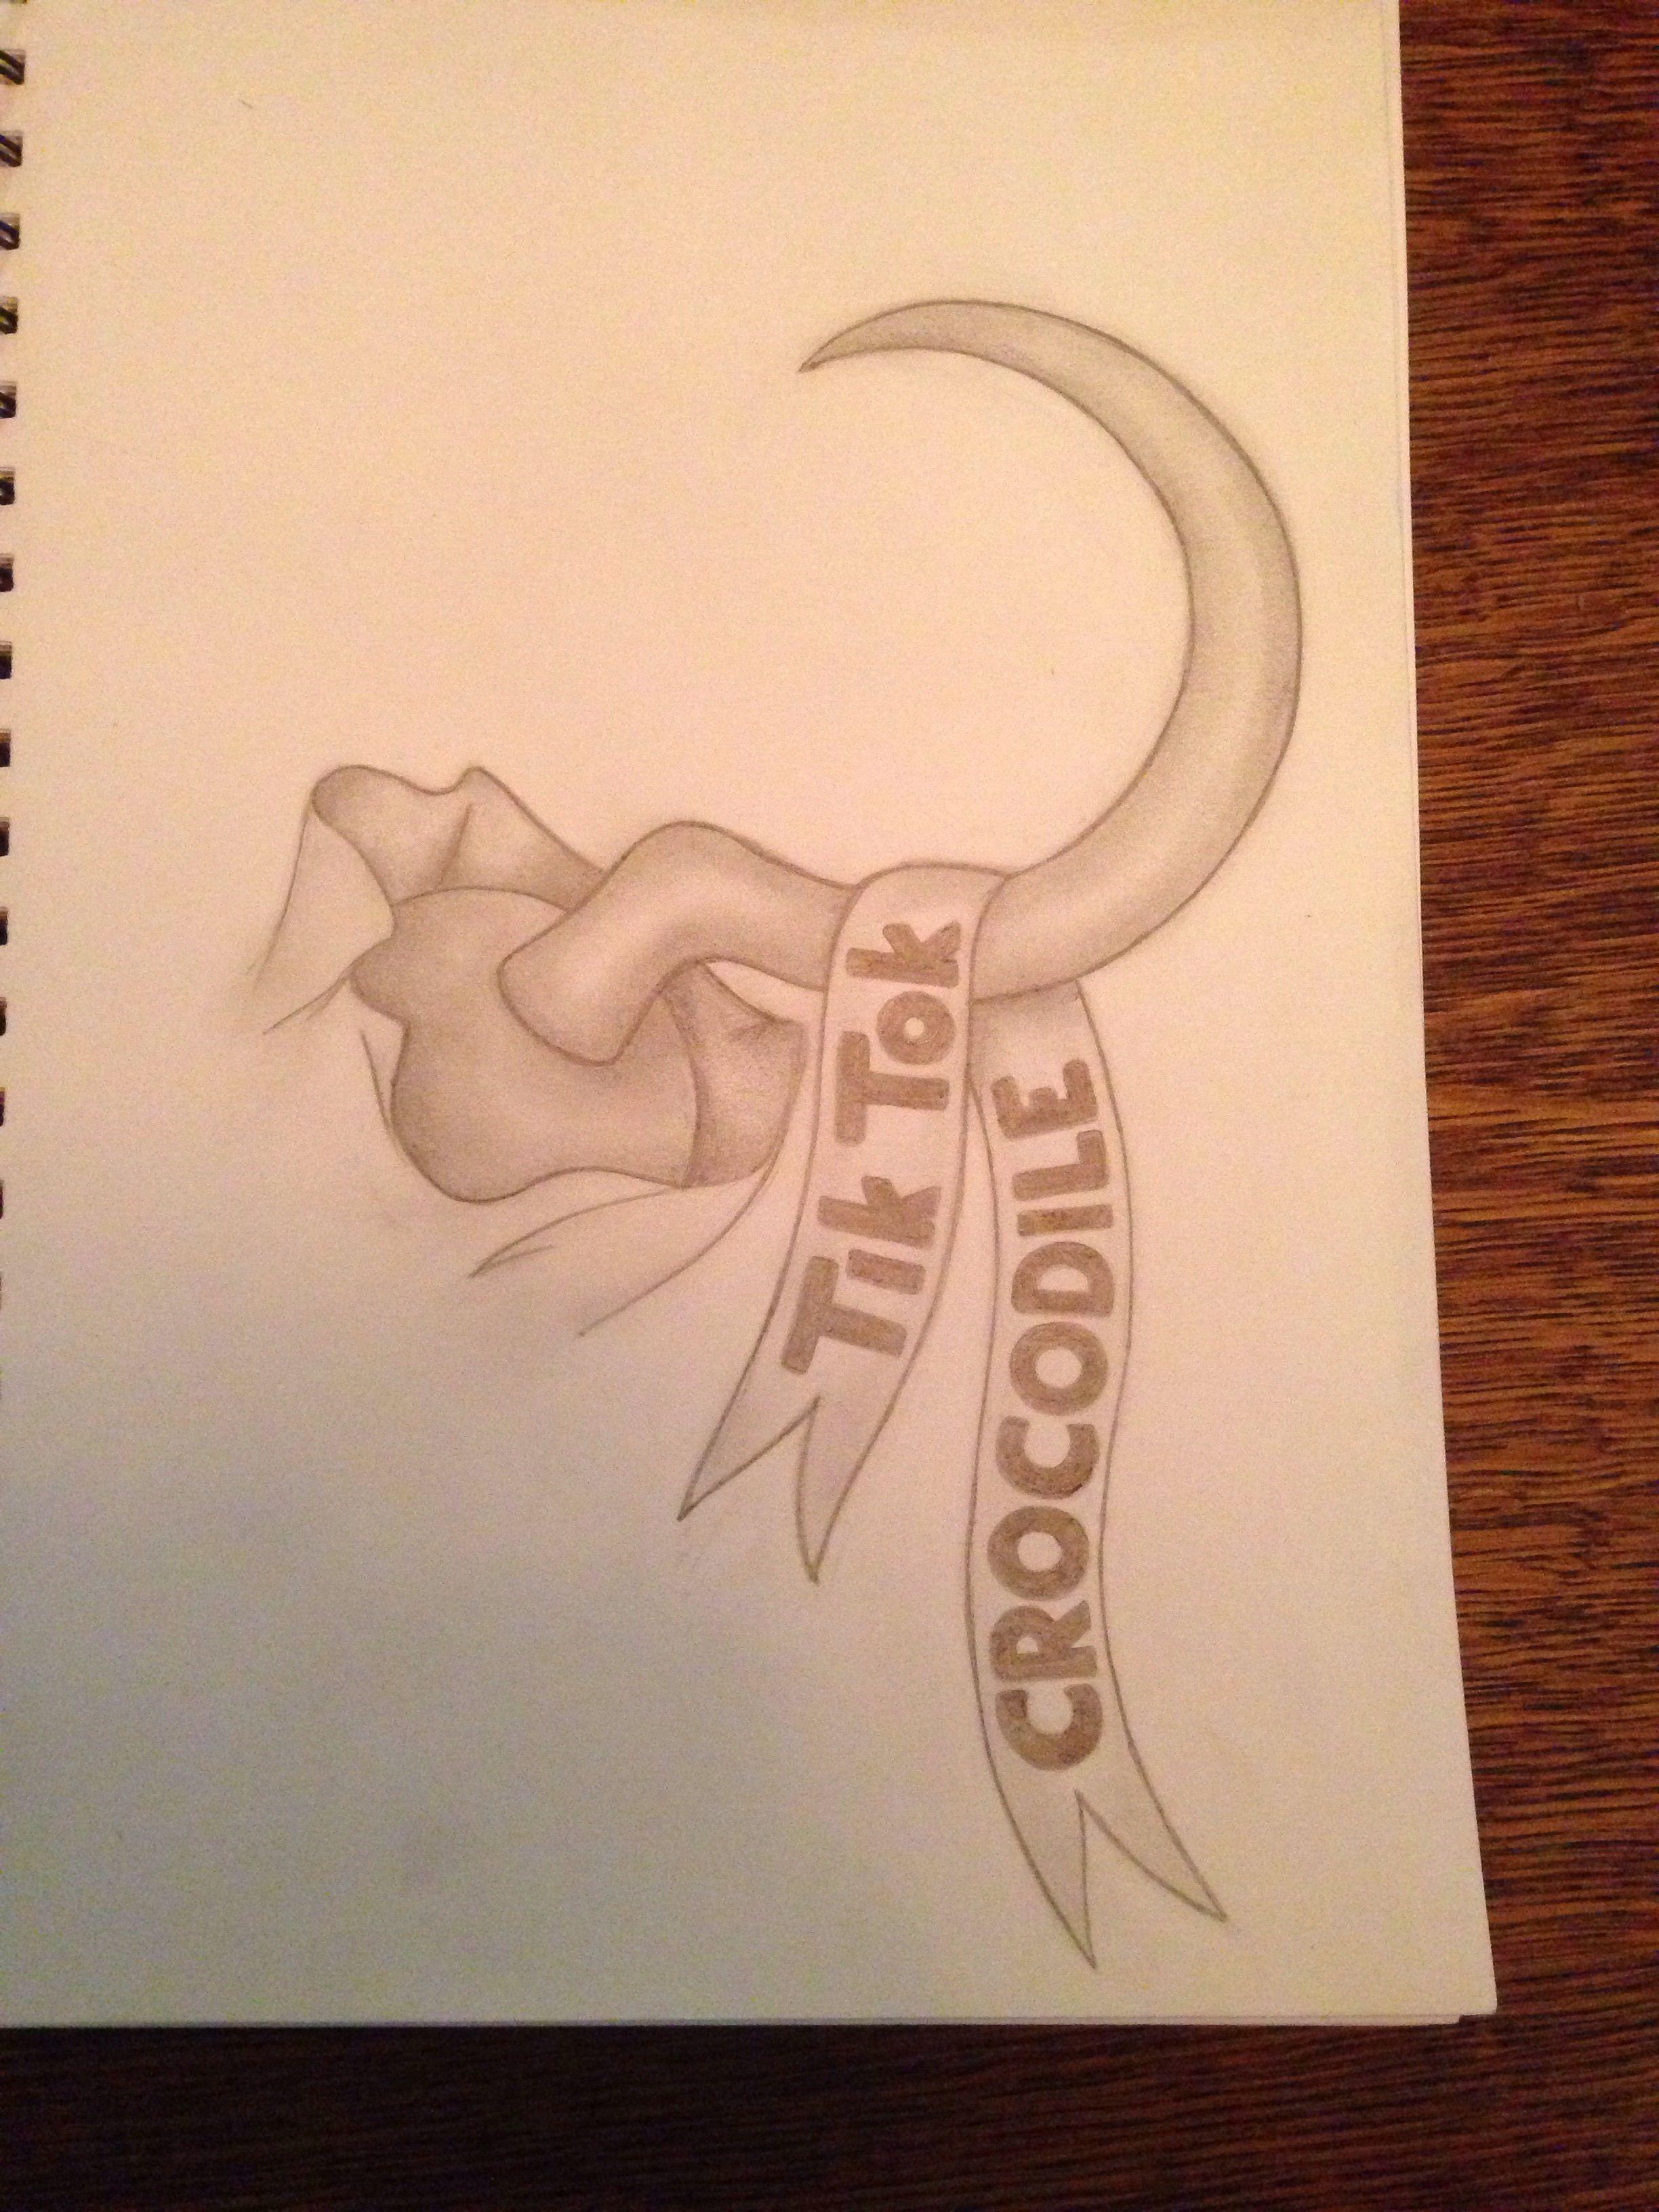 #howto #drawing #drawingtips #art #aesthetic #doodles # ...   Doodle Art Tiktok Doodles